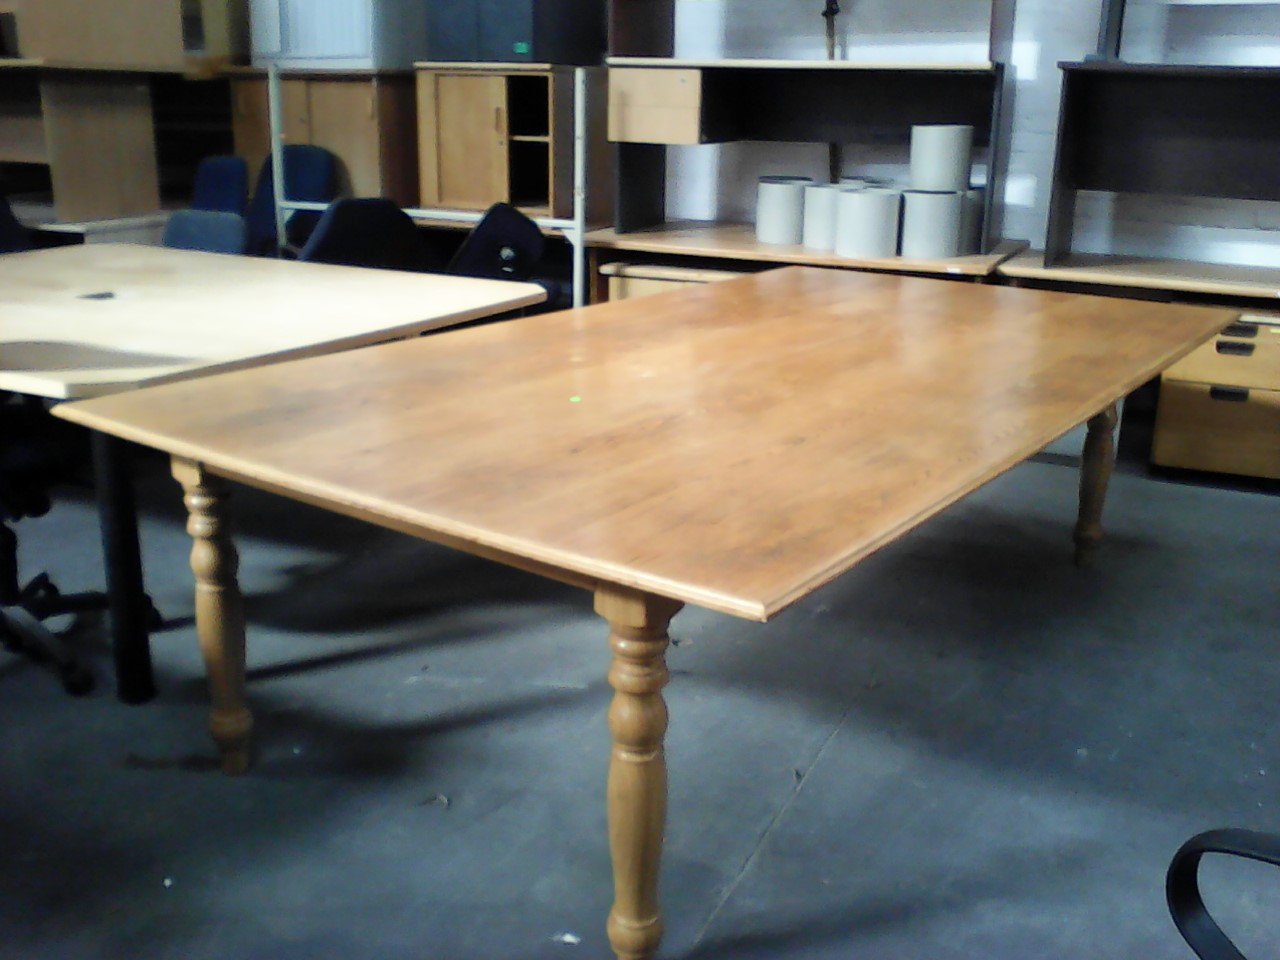 10 to 12 Seater Genuine Oak Boardroom/Dinningroom Table with Table Tennis board on flip side - R5500